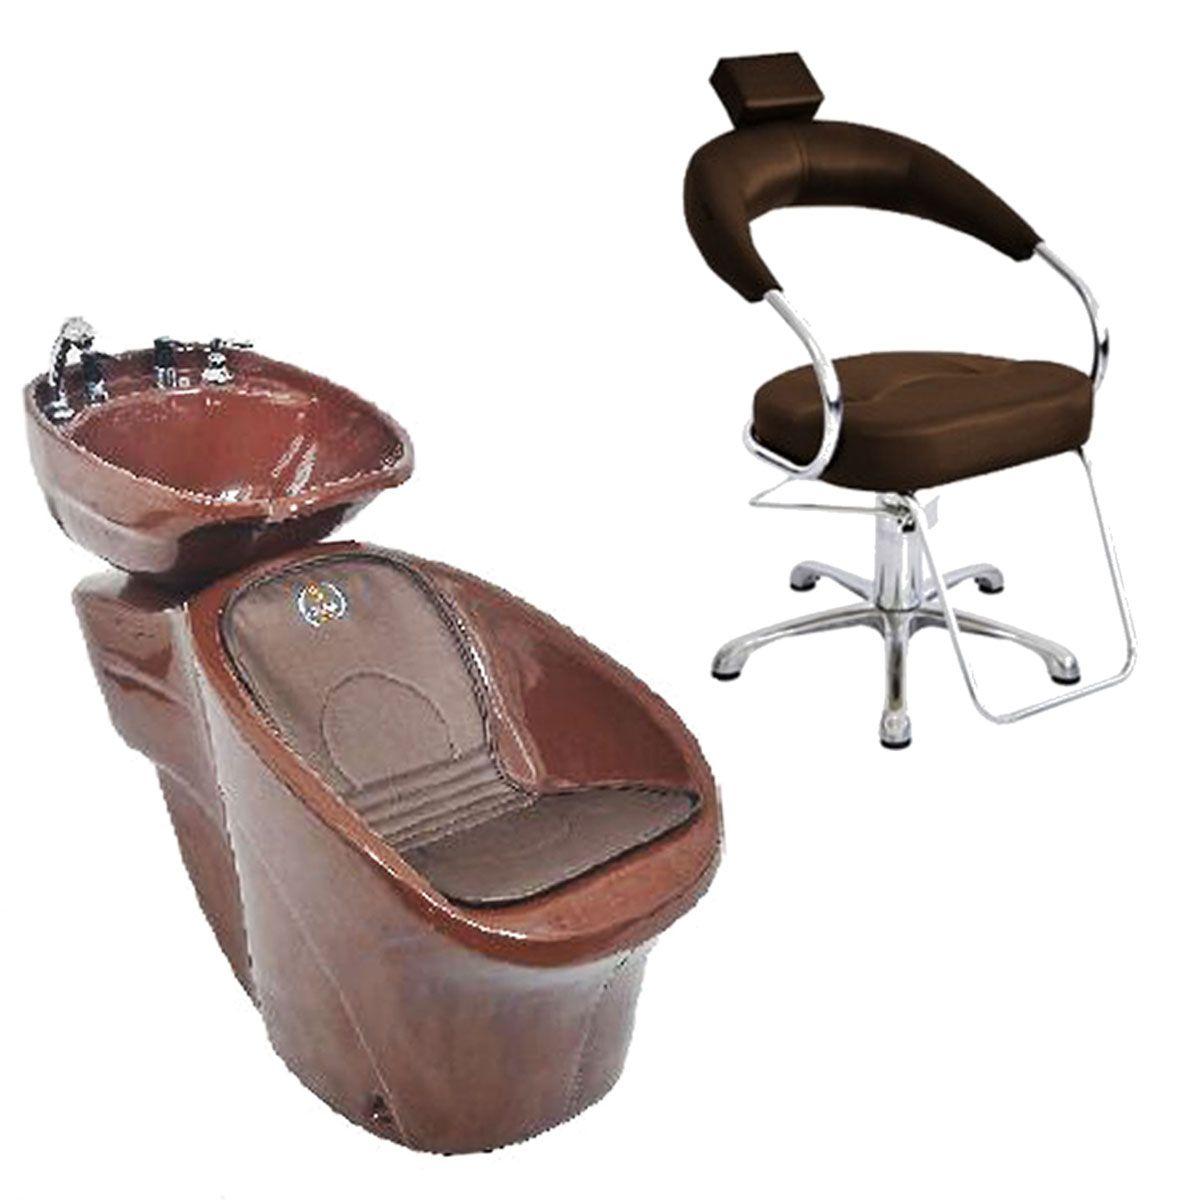 Cadeira Poltrona Hidraulica Futurama Cafe Base Aluminio Escovado + Lavatorio Reclinável Aries Chic L50 Marrom/Branco